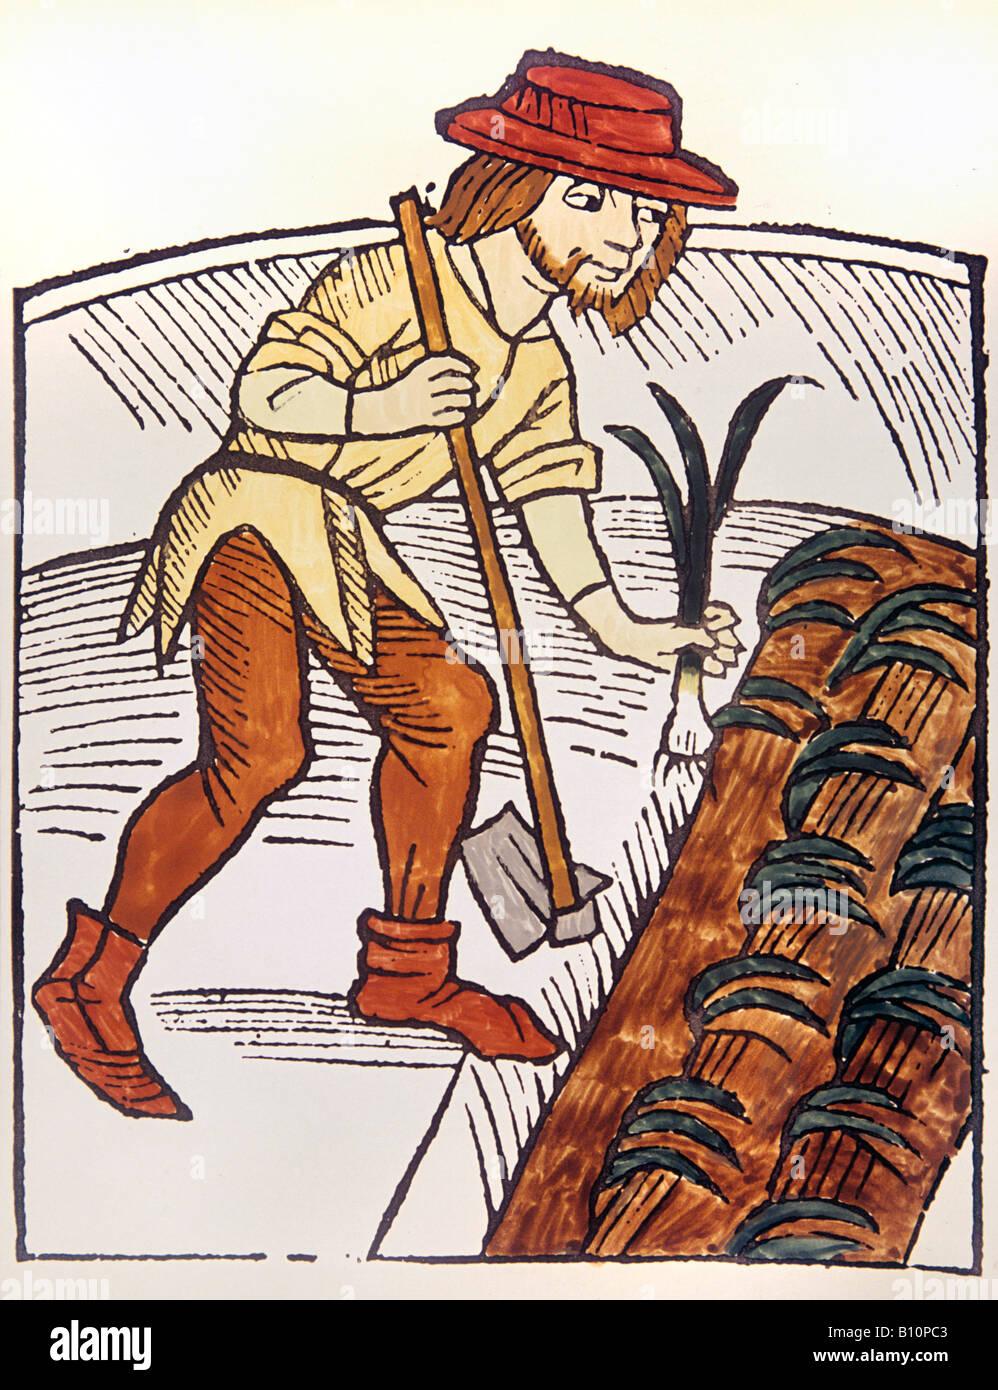 Plantio de alhos franceses xv c xilogravura Medieval autor AAAC Ltd Imagens de Stock